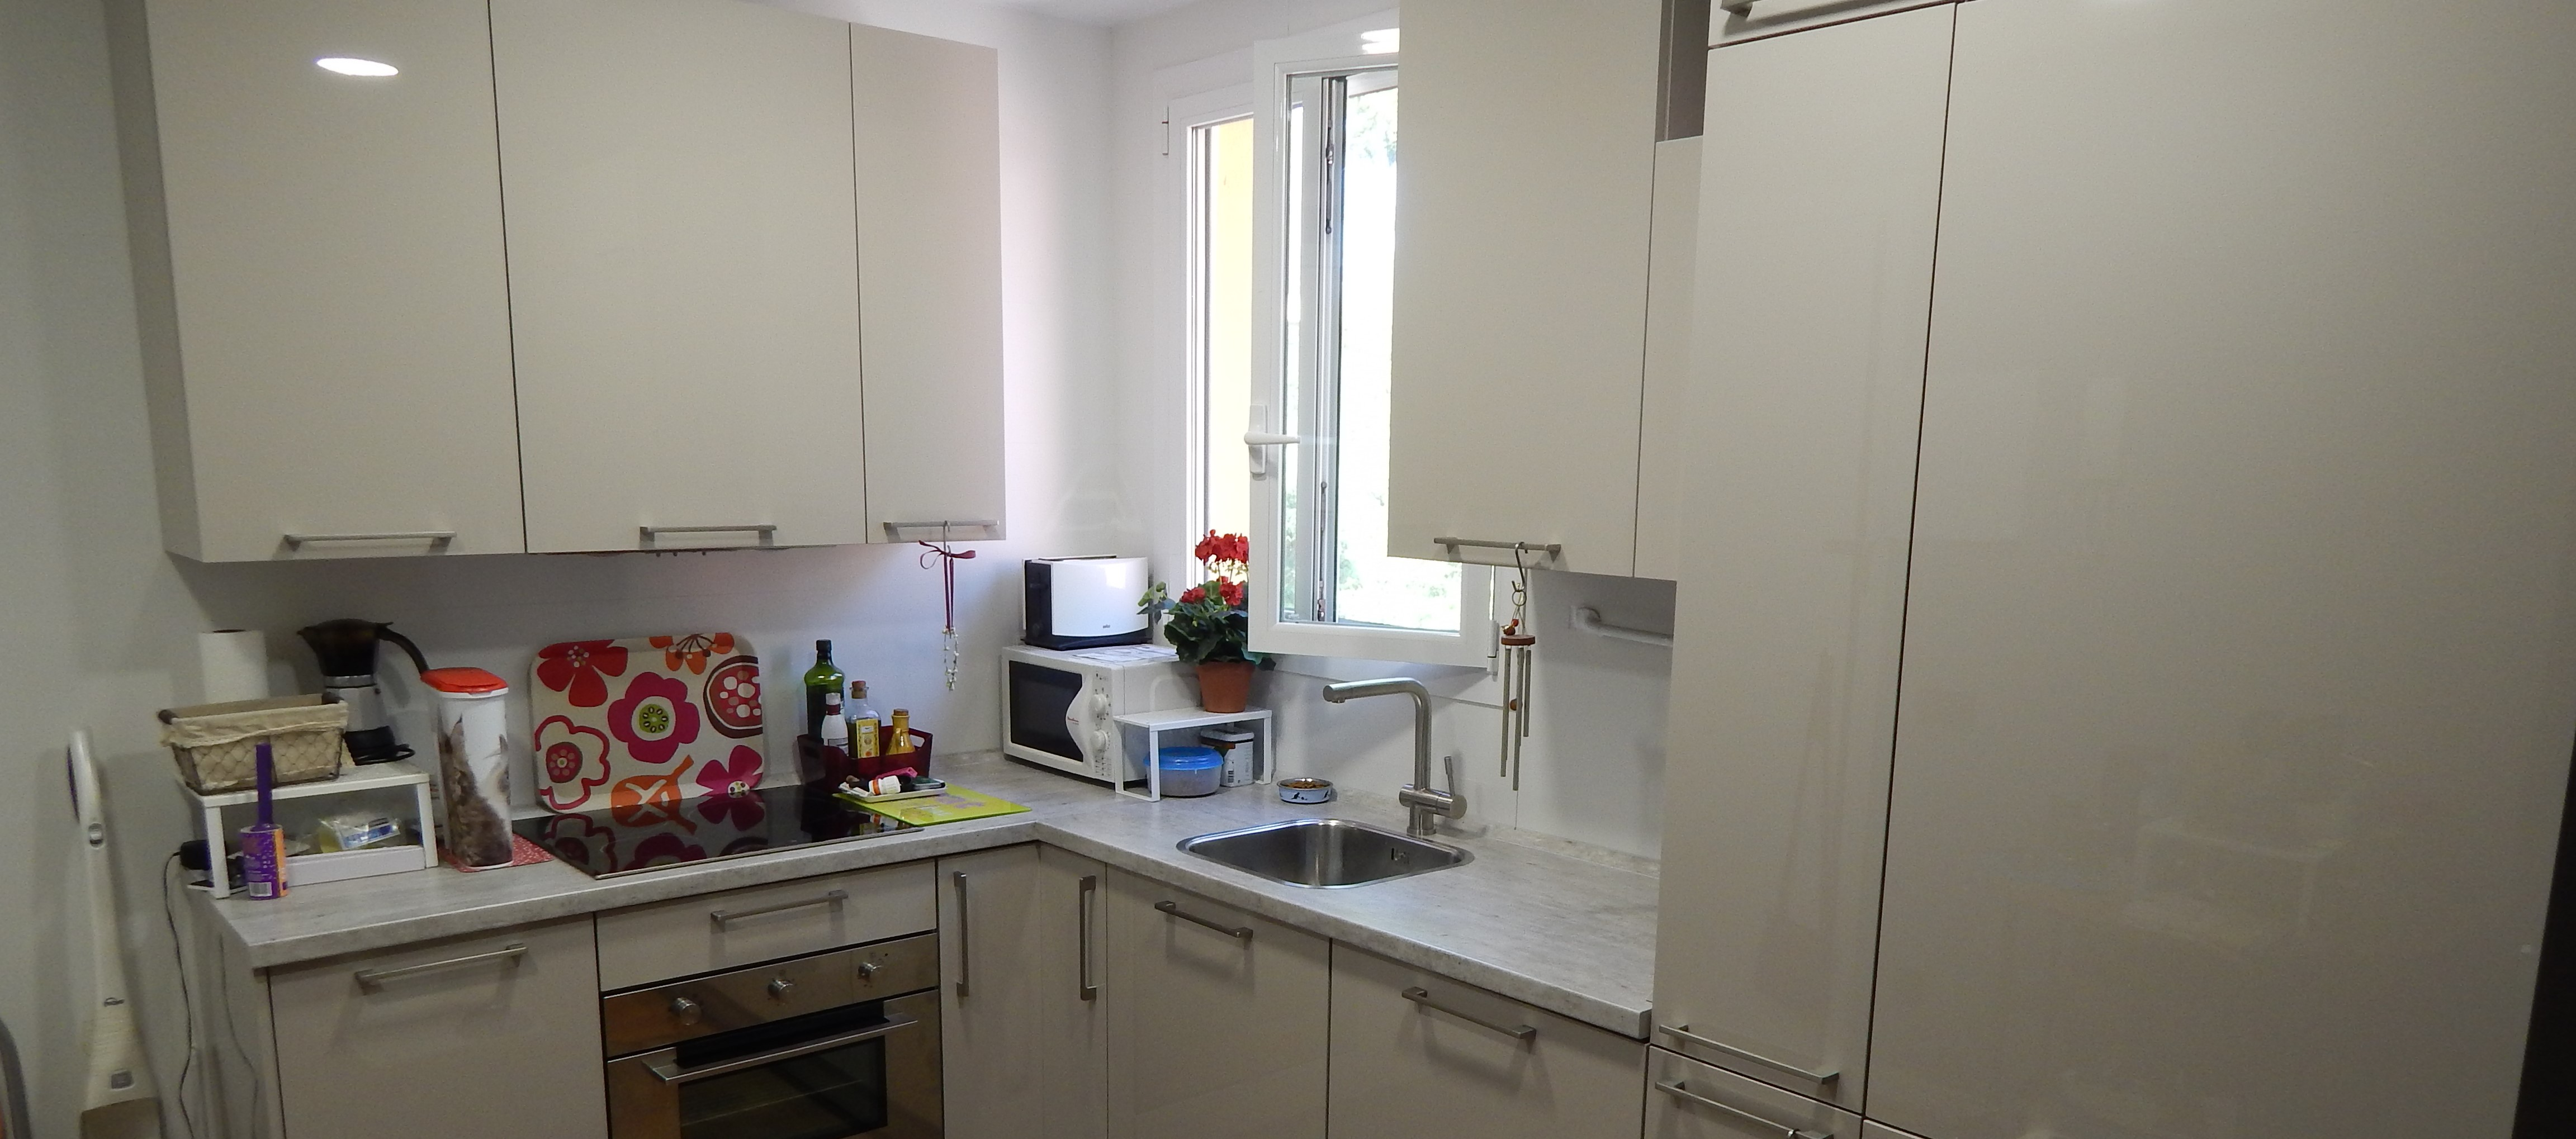 Muebles de cocina cachemir alto brillo for Muebles altos de cocina